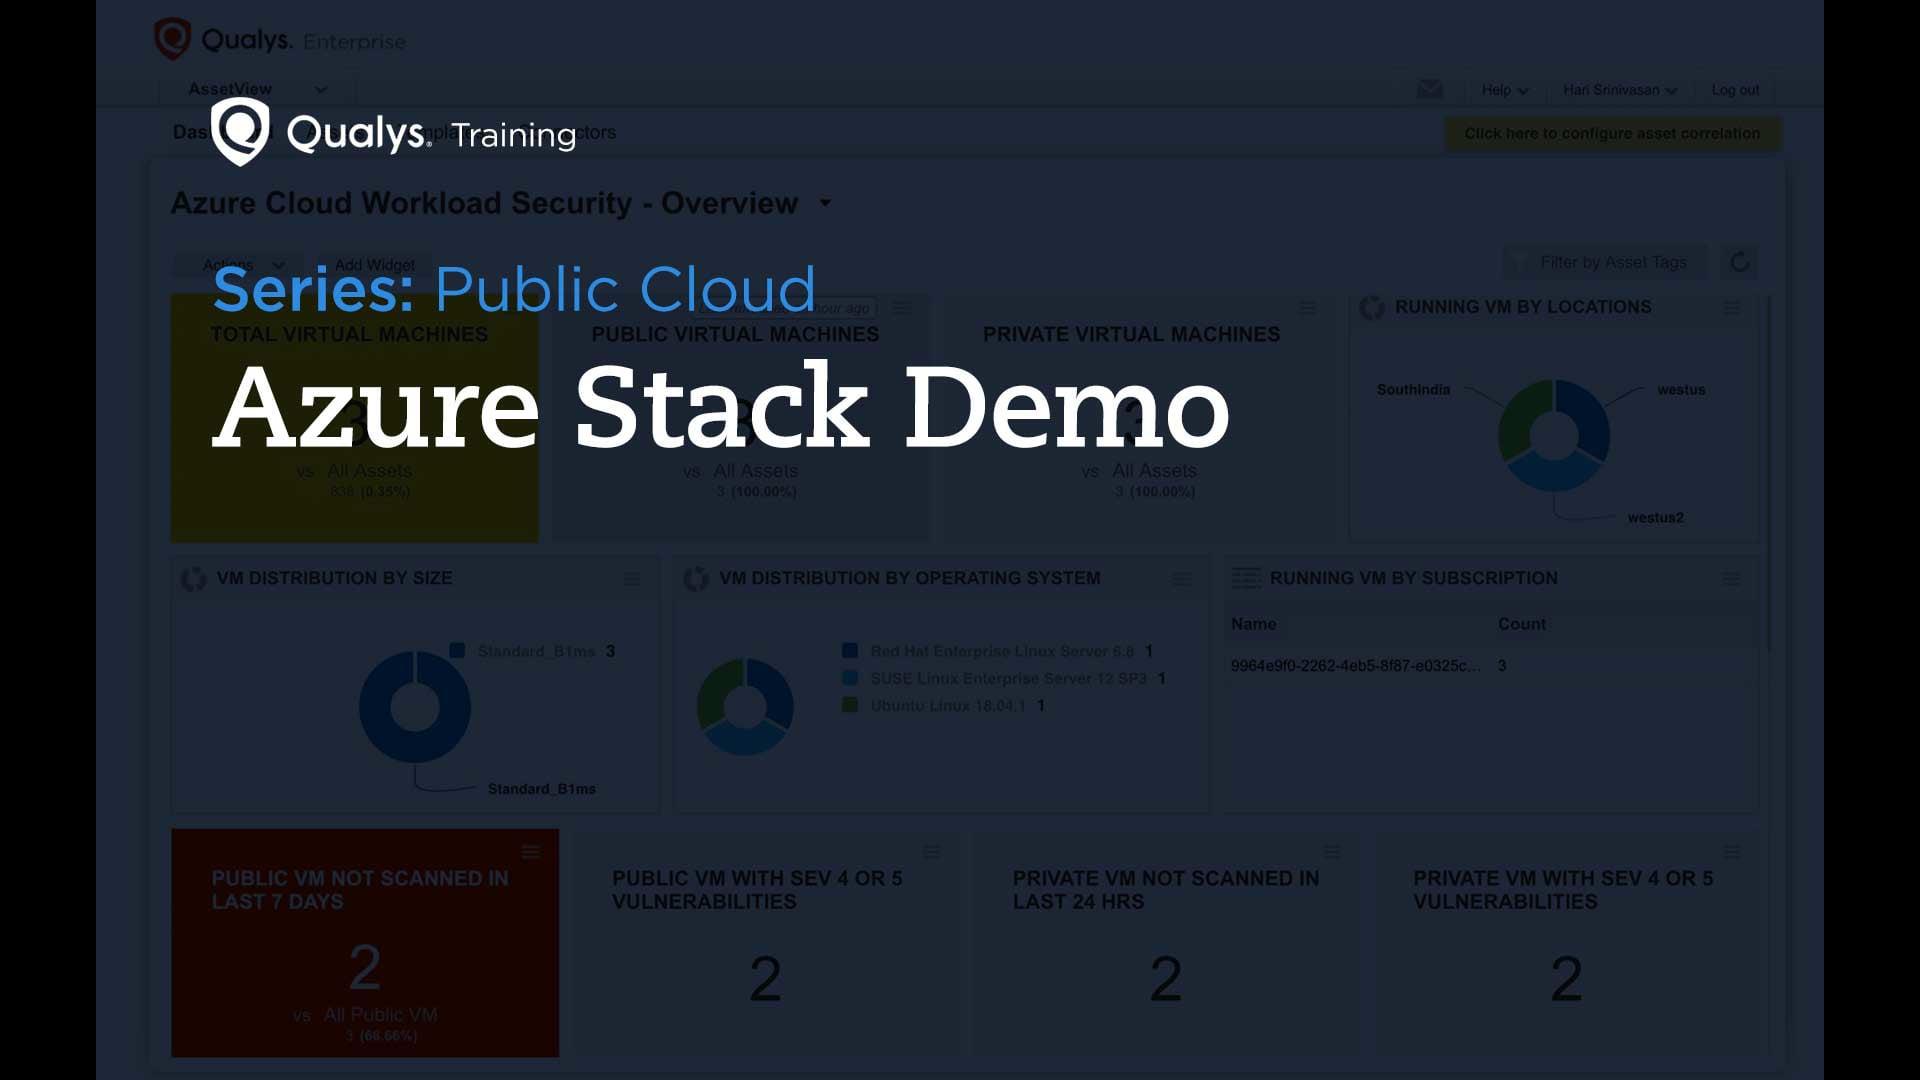 Azure Stack Demo